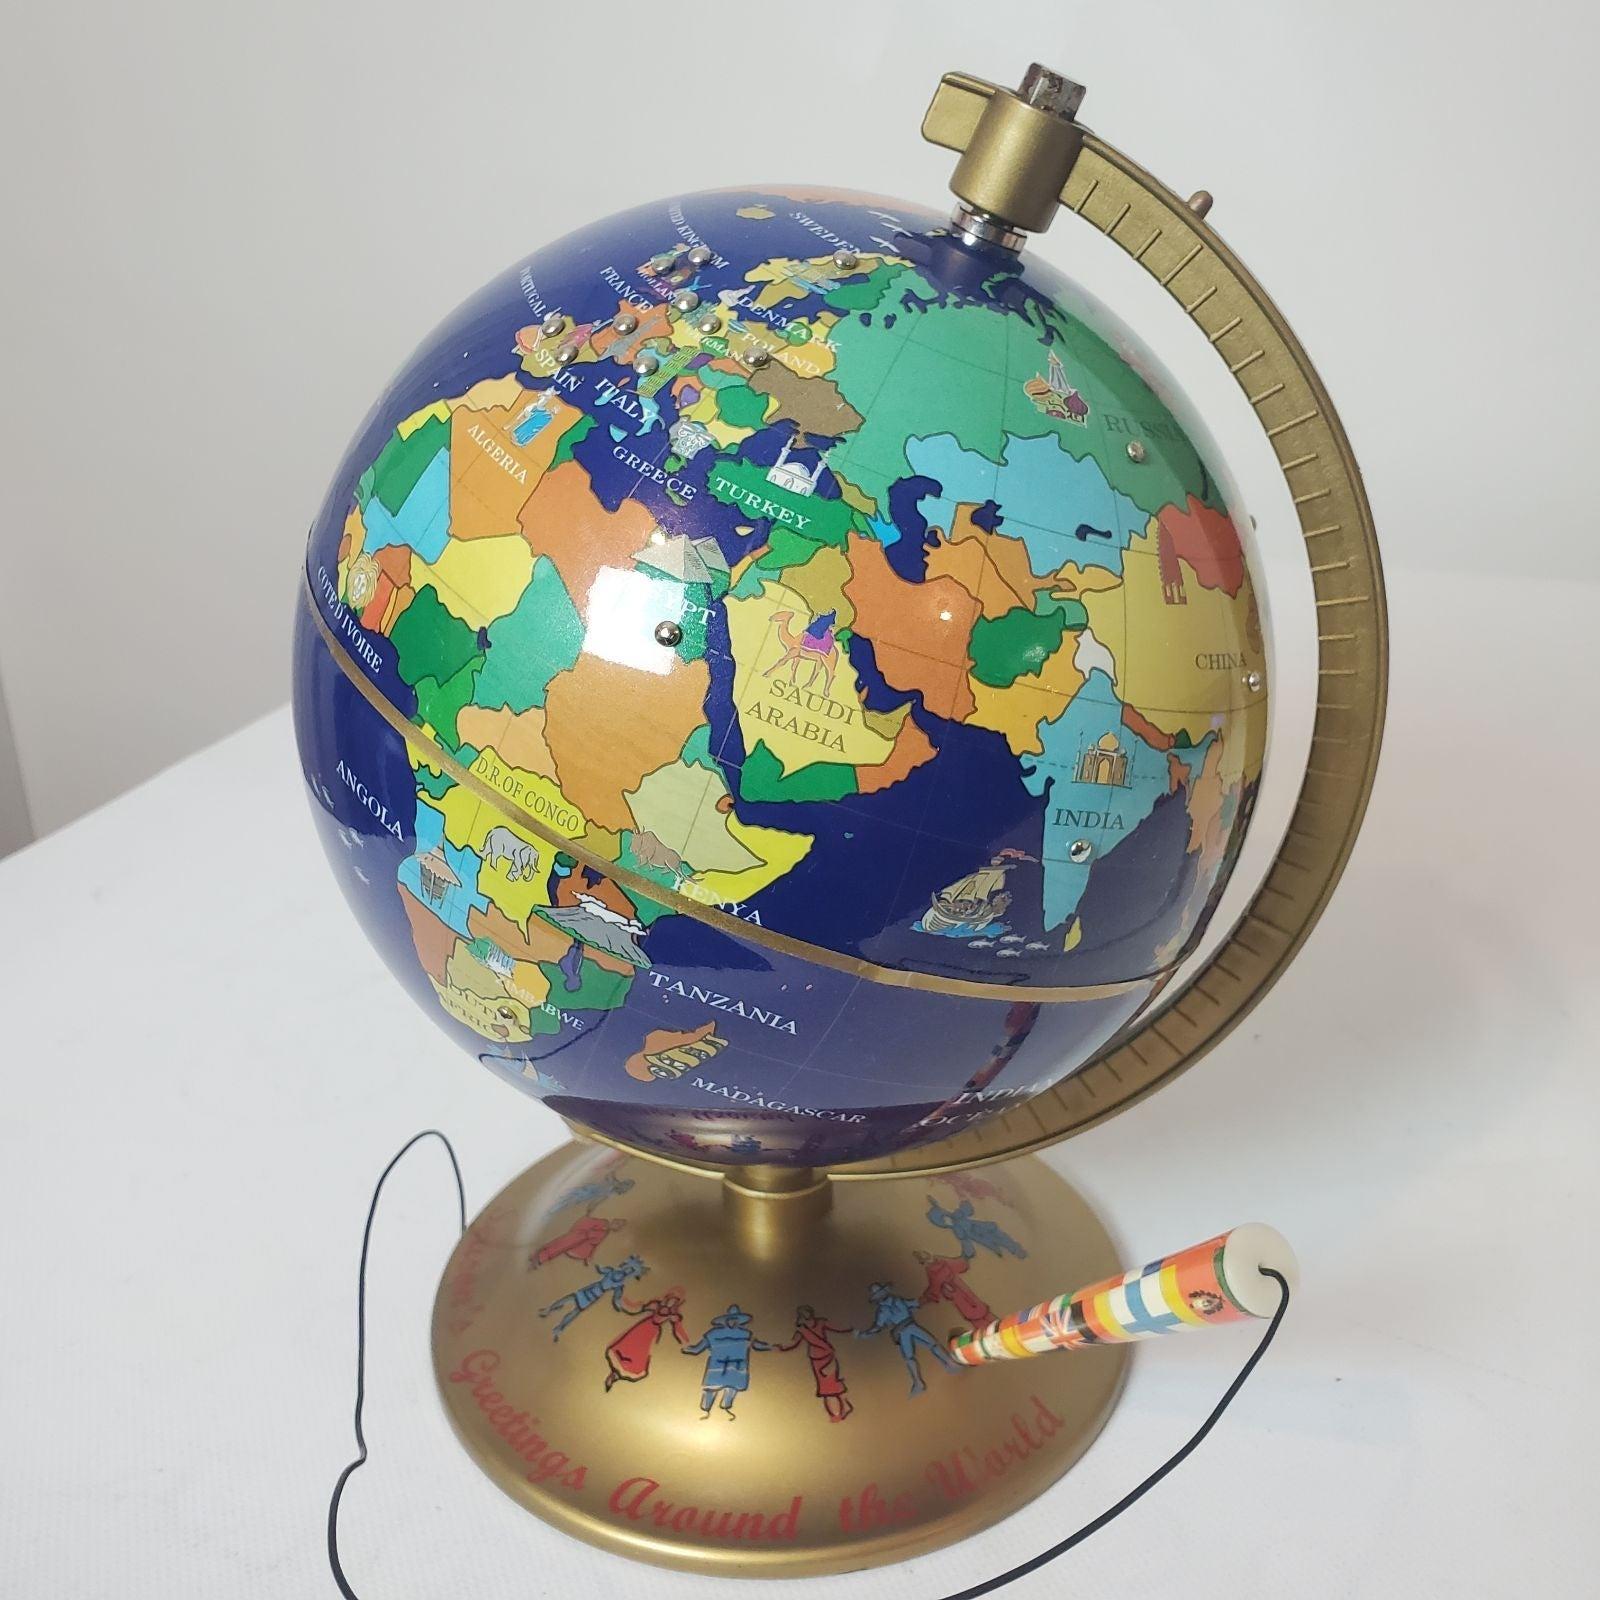 Mr. Christmas Talking Globe 22 Languages